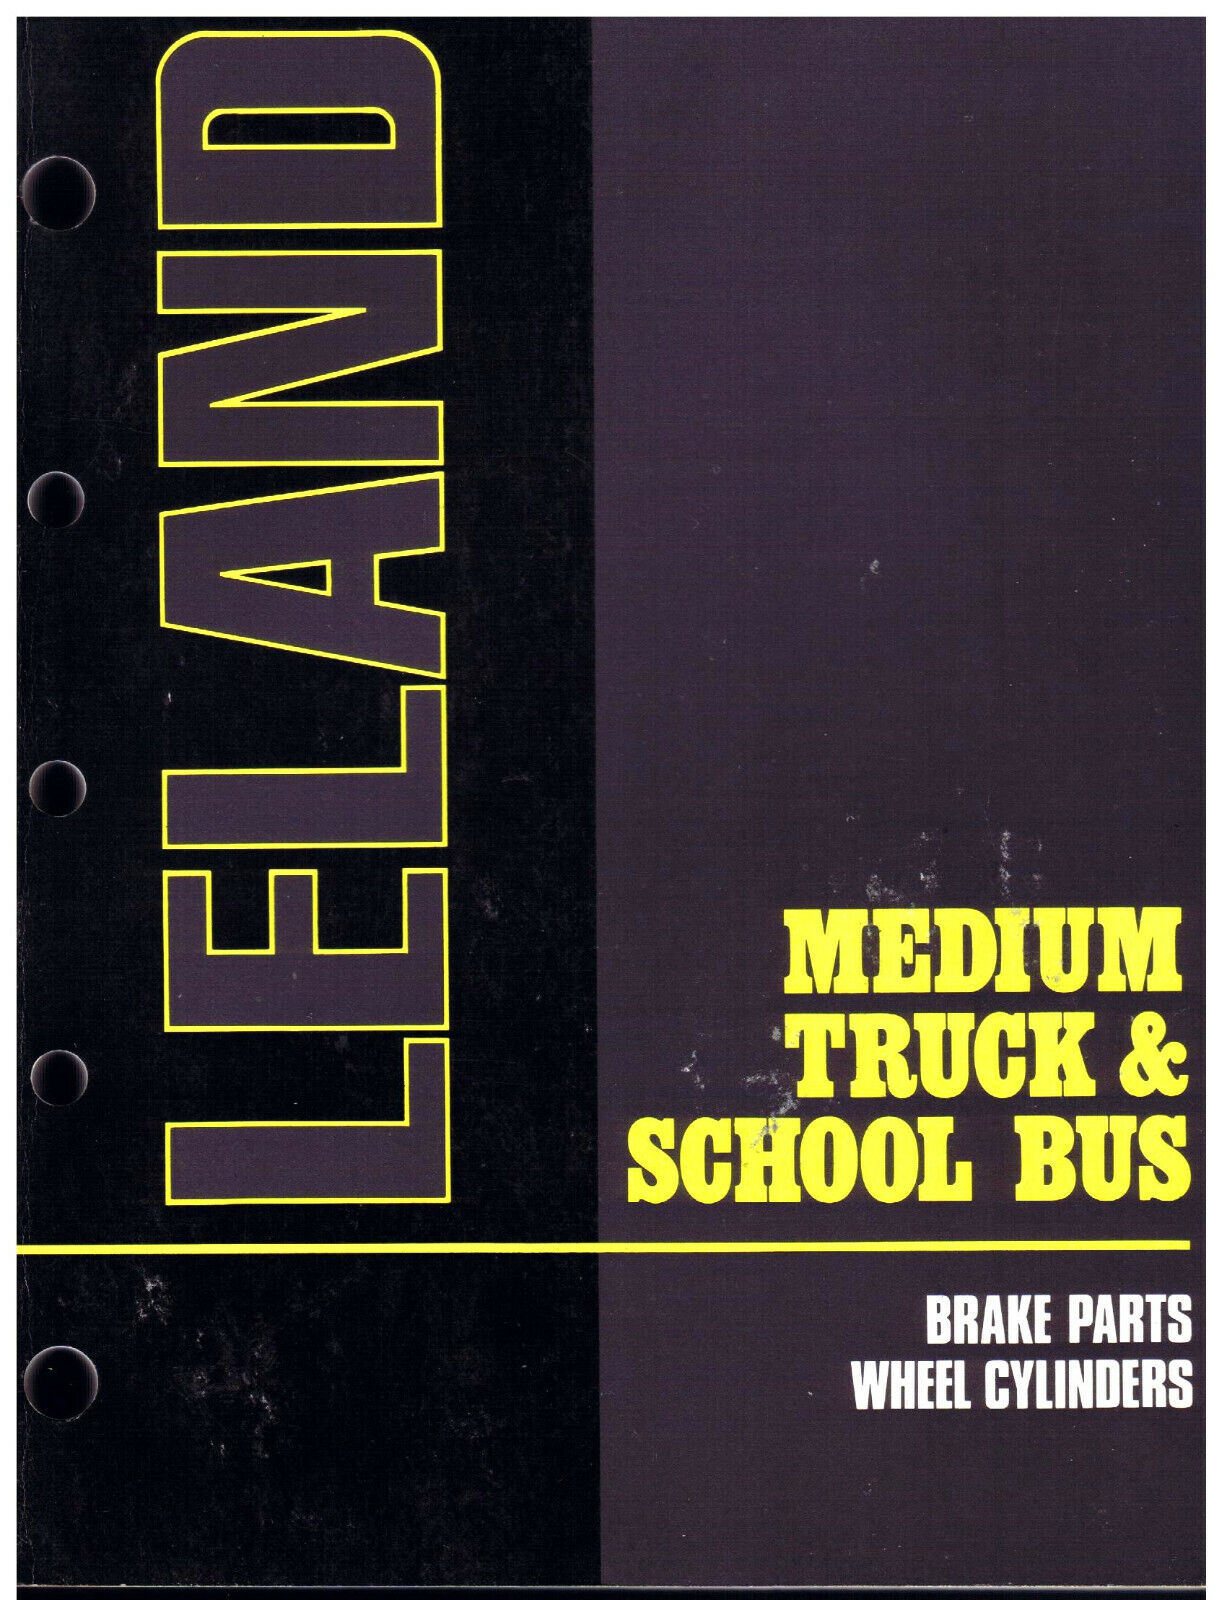 1991 Leland Medium Truck + School Bus Brake Parts Wheel Cylinders Catalog